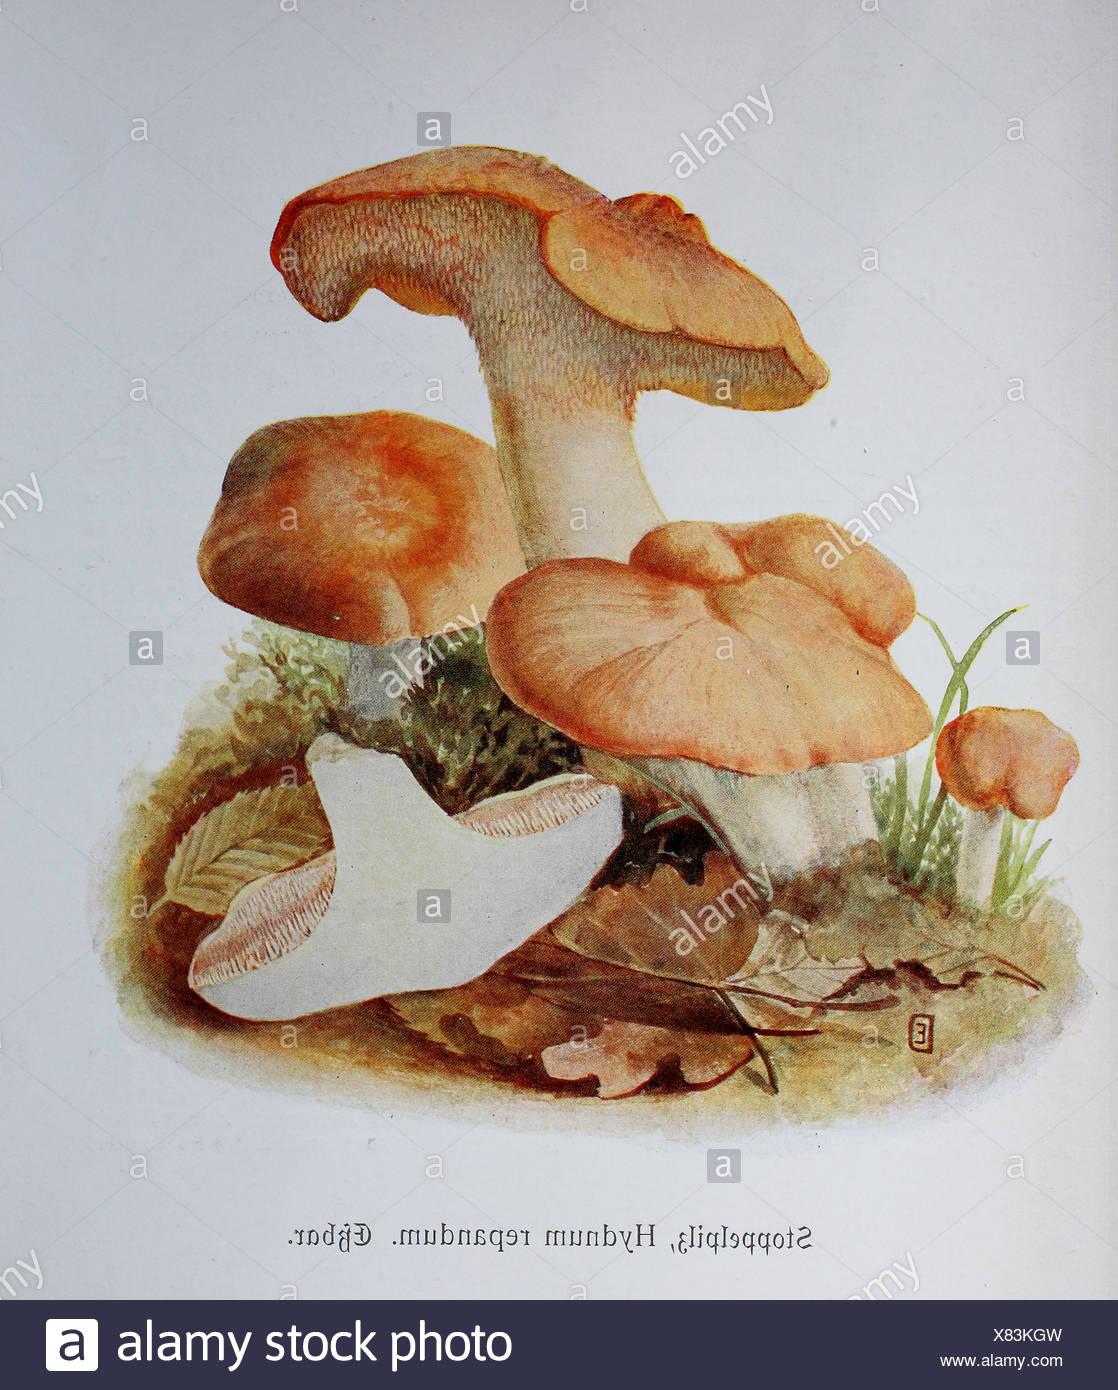 Stoppelpilz, Hydnum repandum, digitale Reproduktion einer illustrazione von Emil Doerstling (1859-1940) Immagini Stock